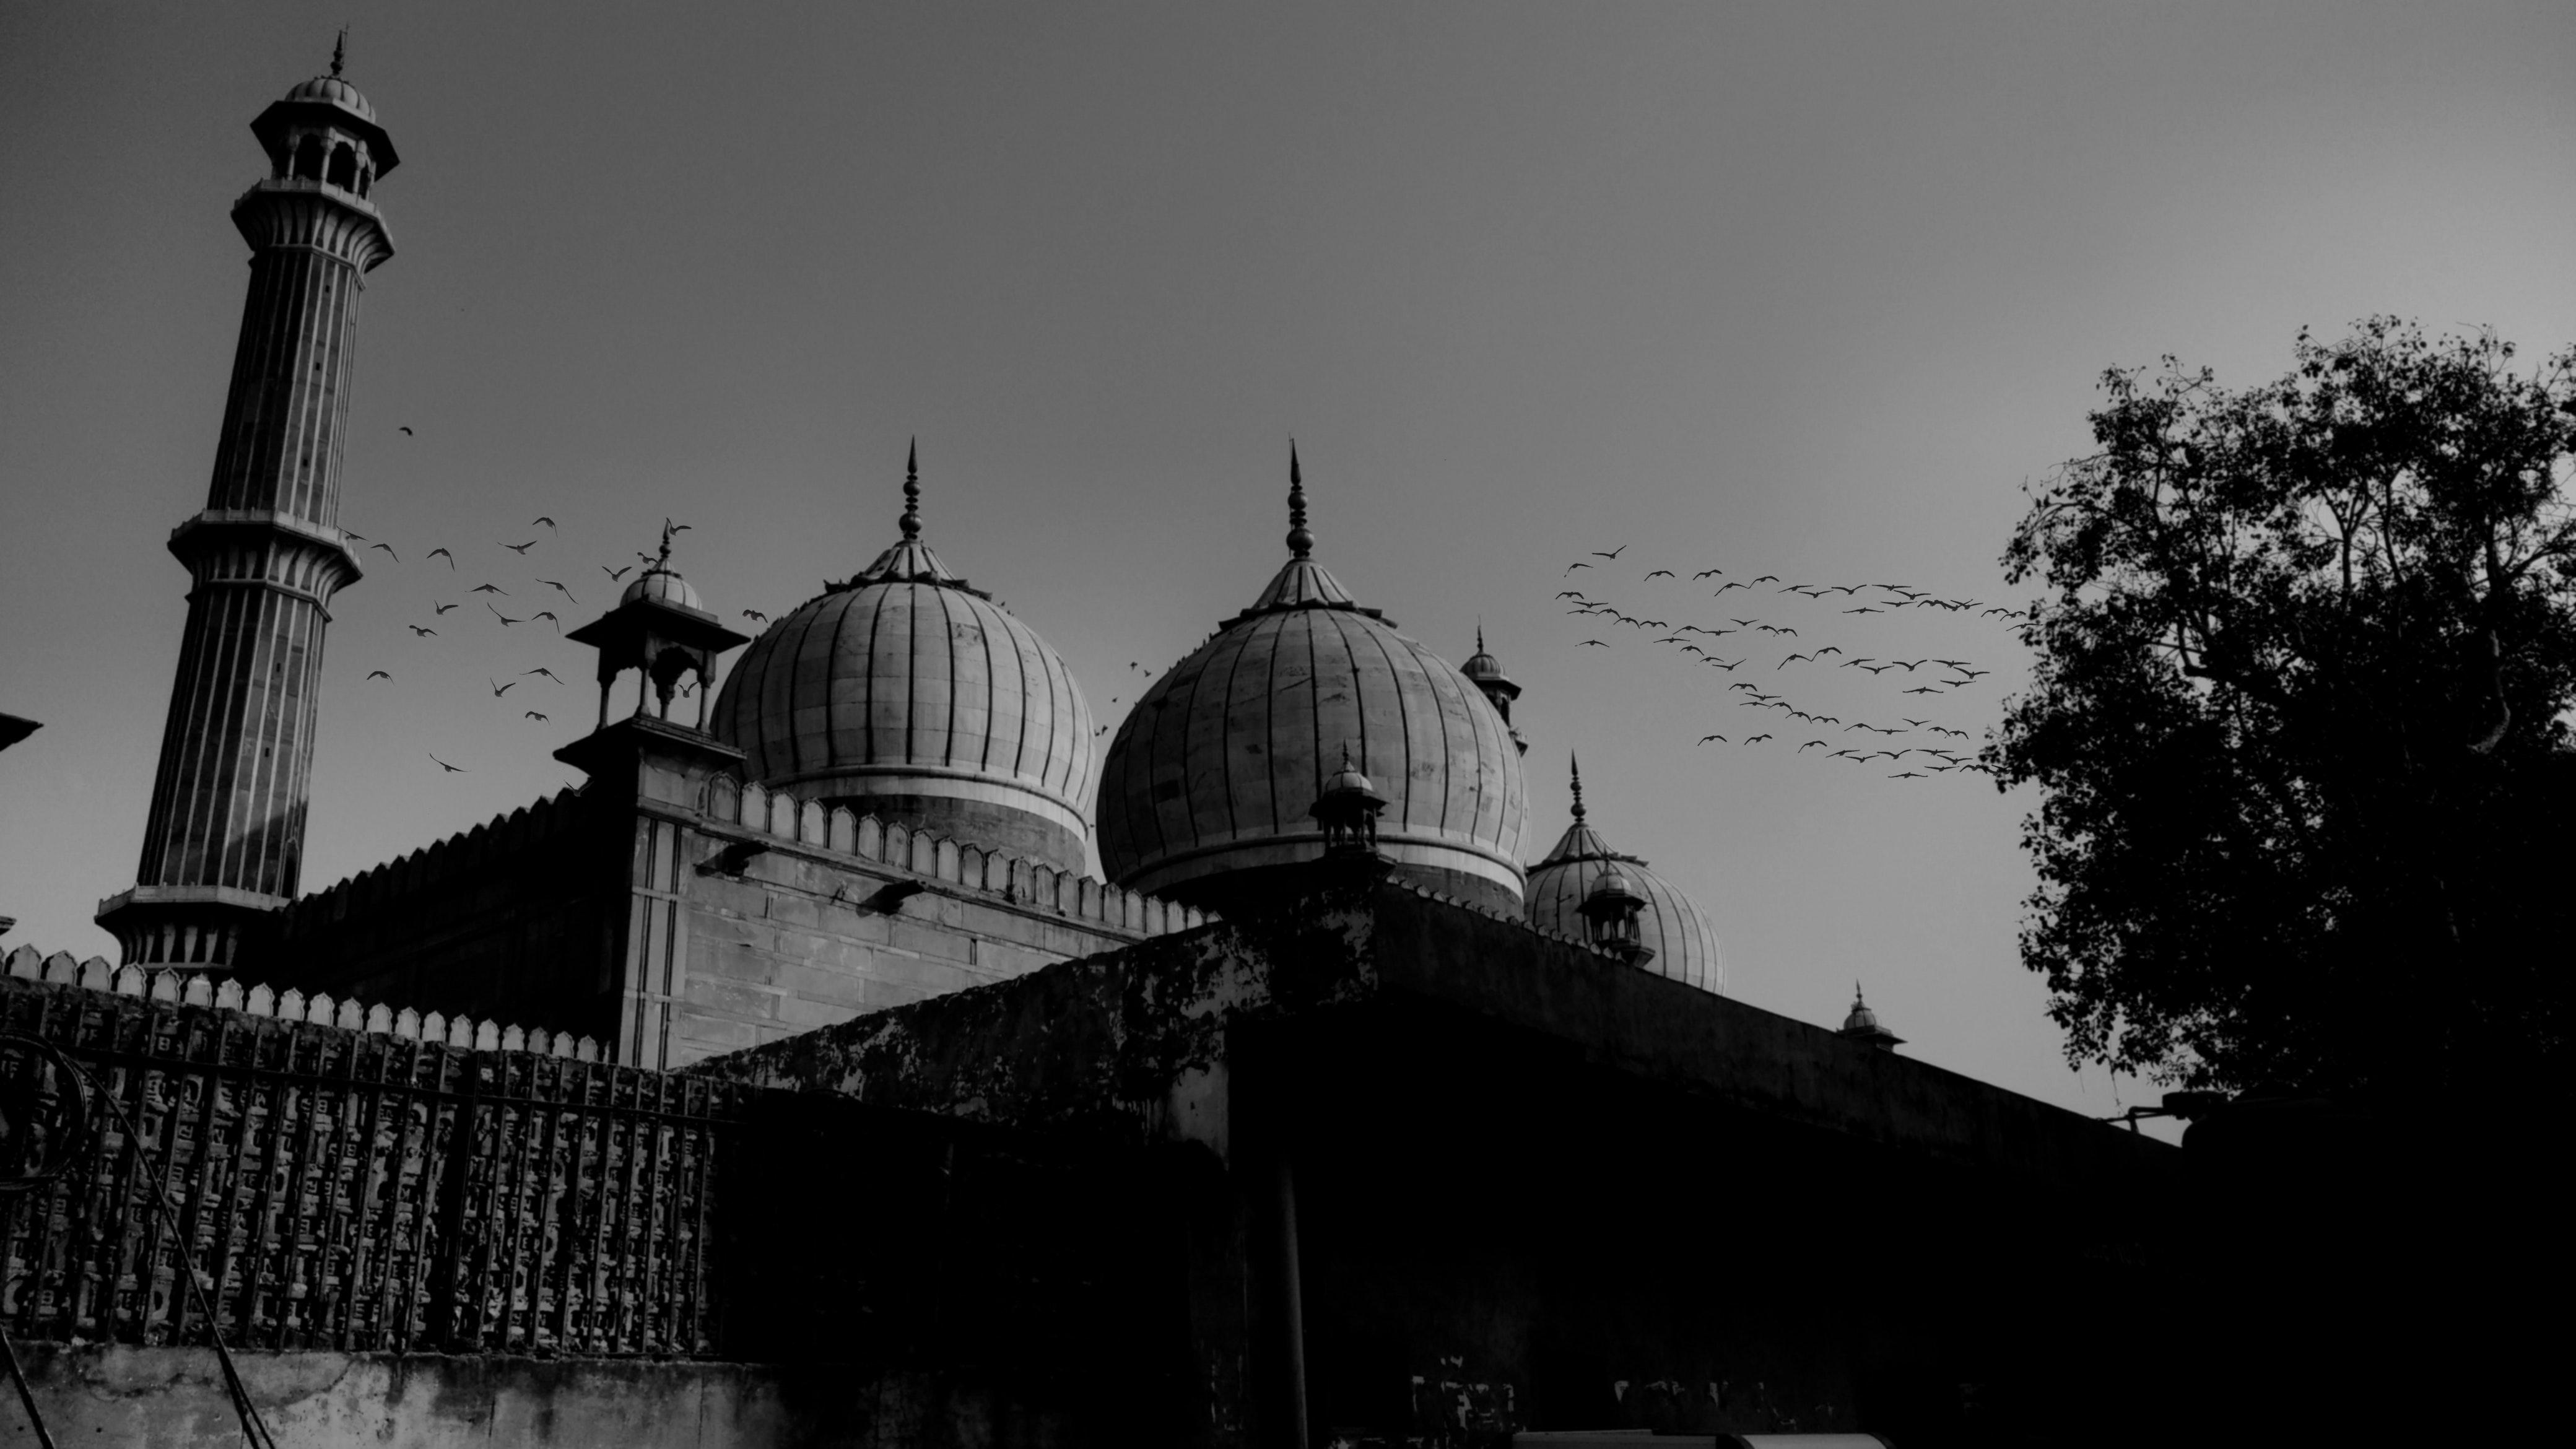 Grayscale Photo of Mosque, Architecture, Minaret, Tower, Tourism, HQ Photo